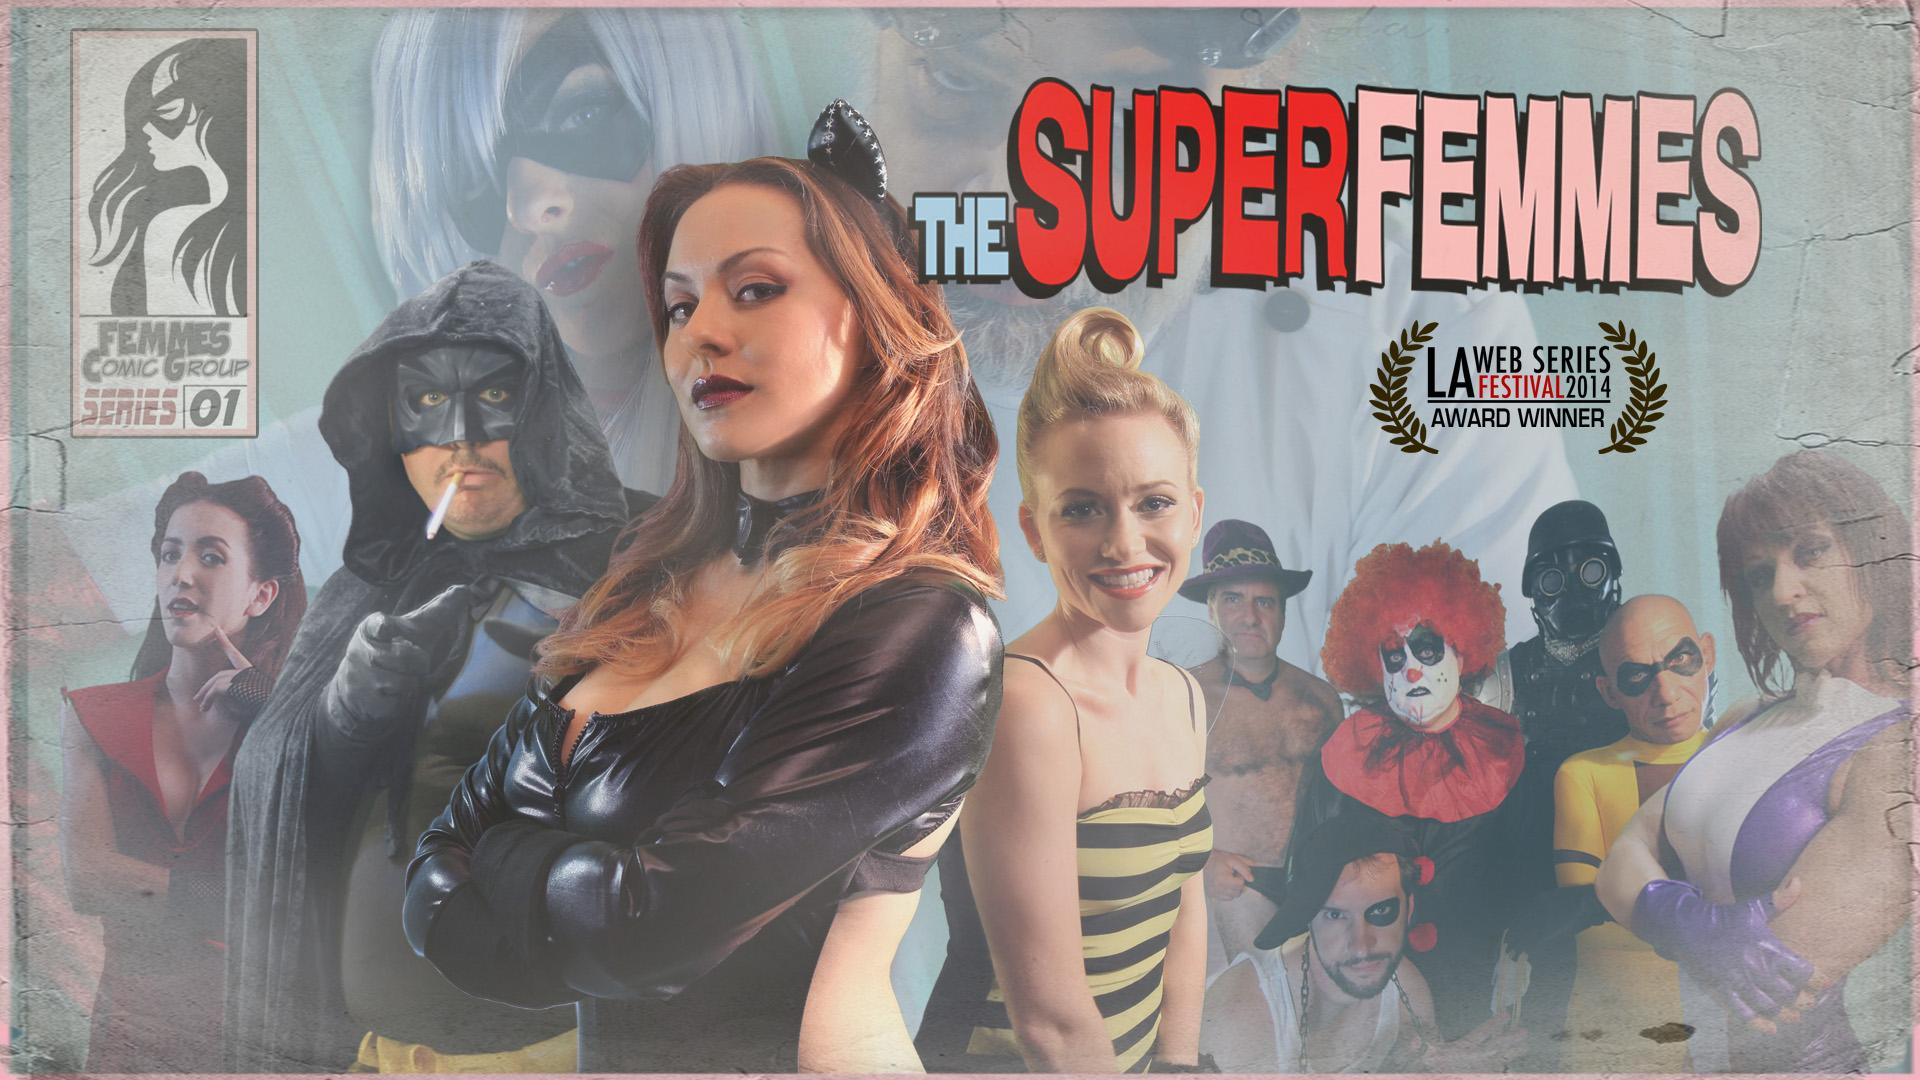 The Super Femmes